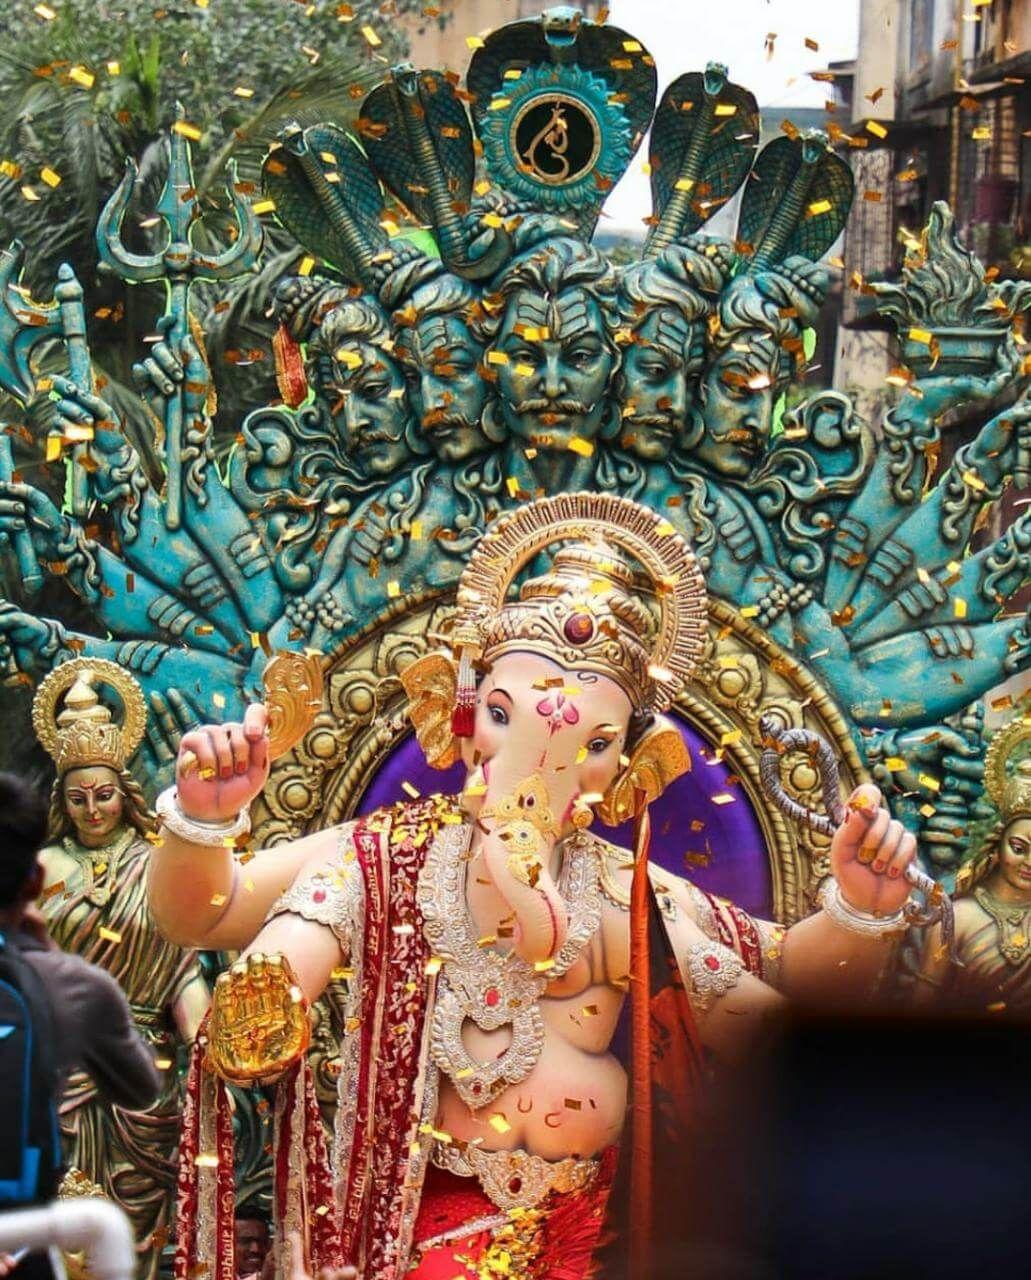 Chintamani Ganpati 2019 Photos Online Ganesh Wallpaper Hanuman Hd Wallpaper Ganesh Images